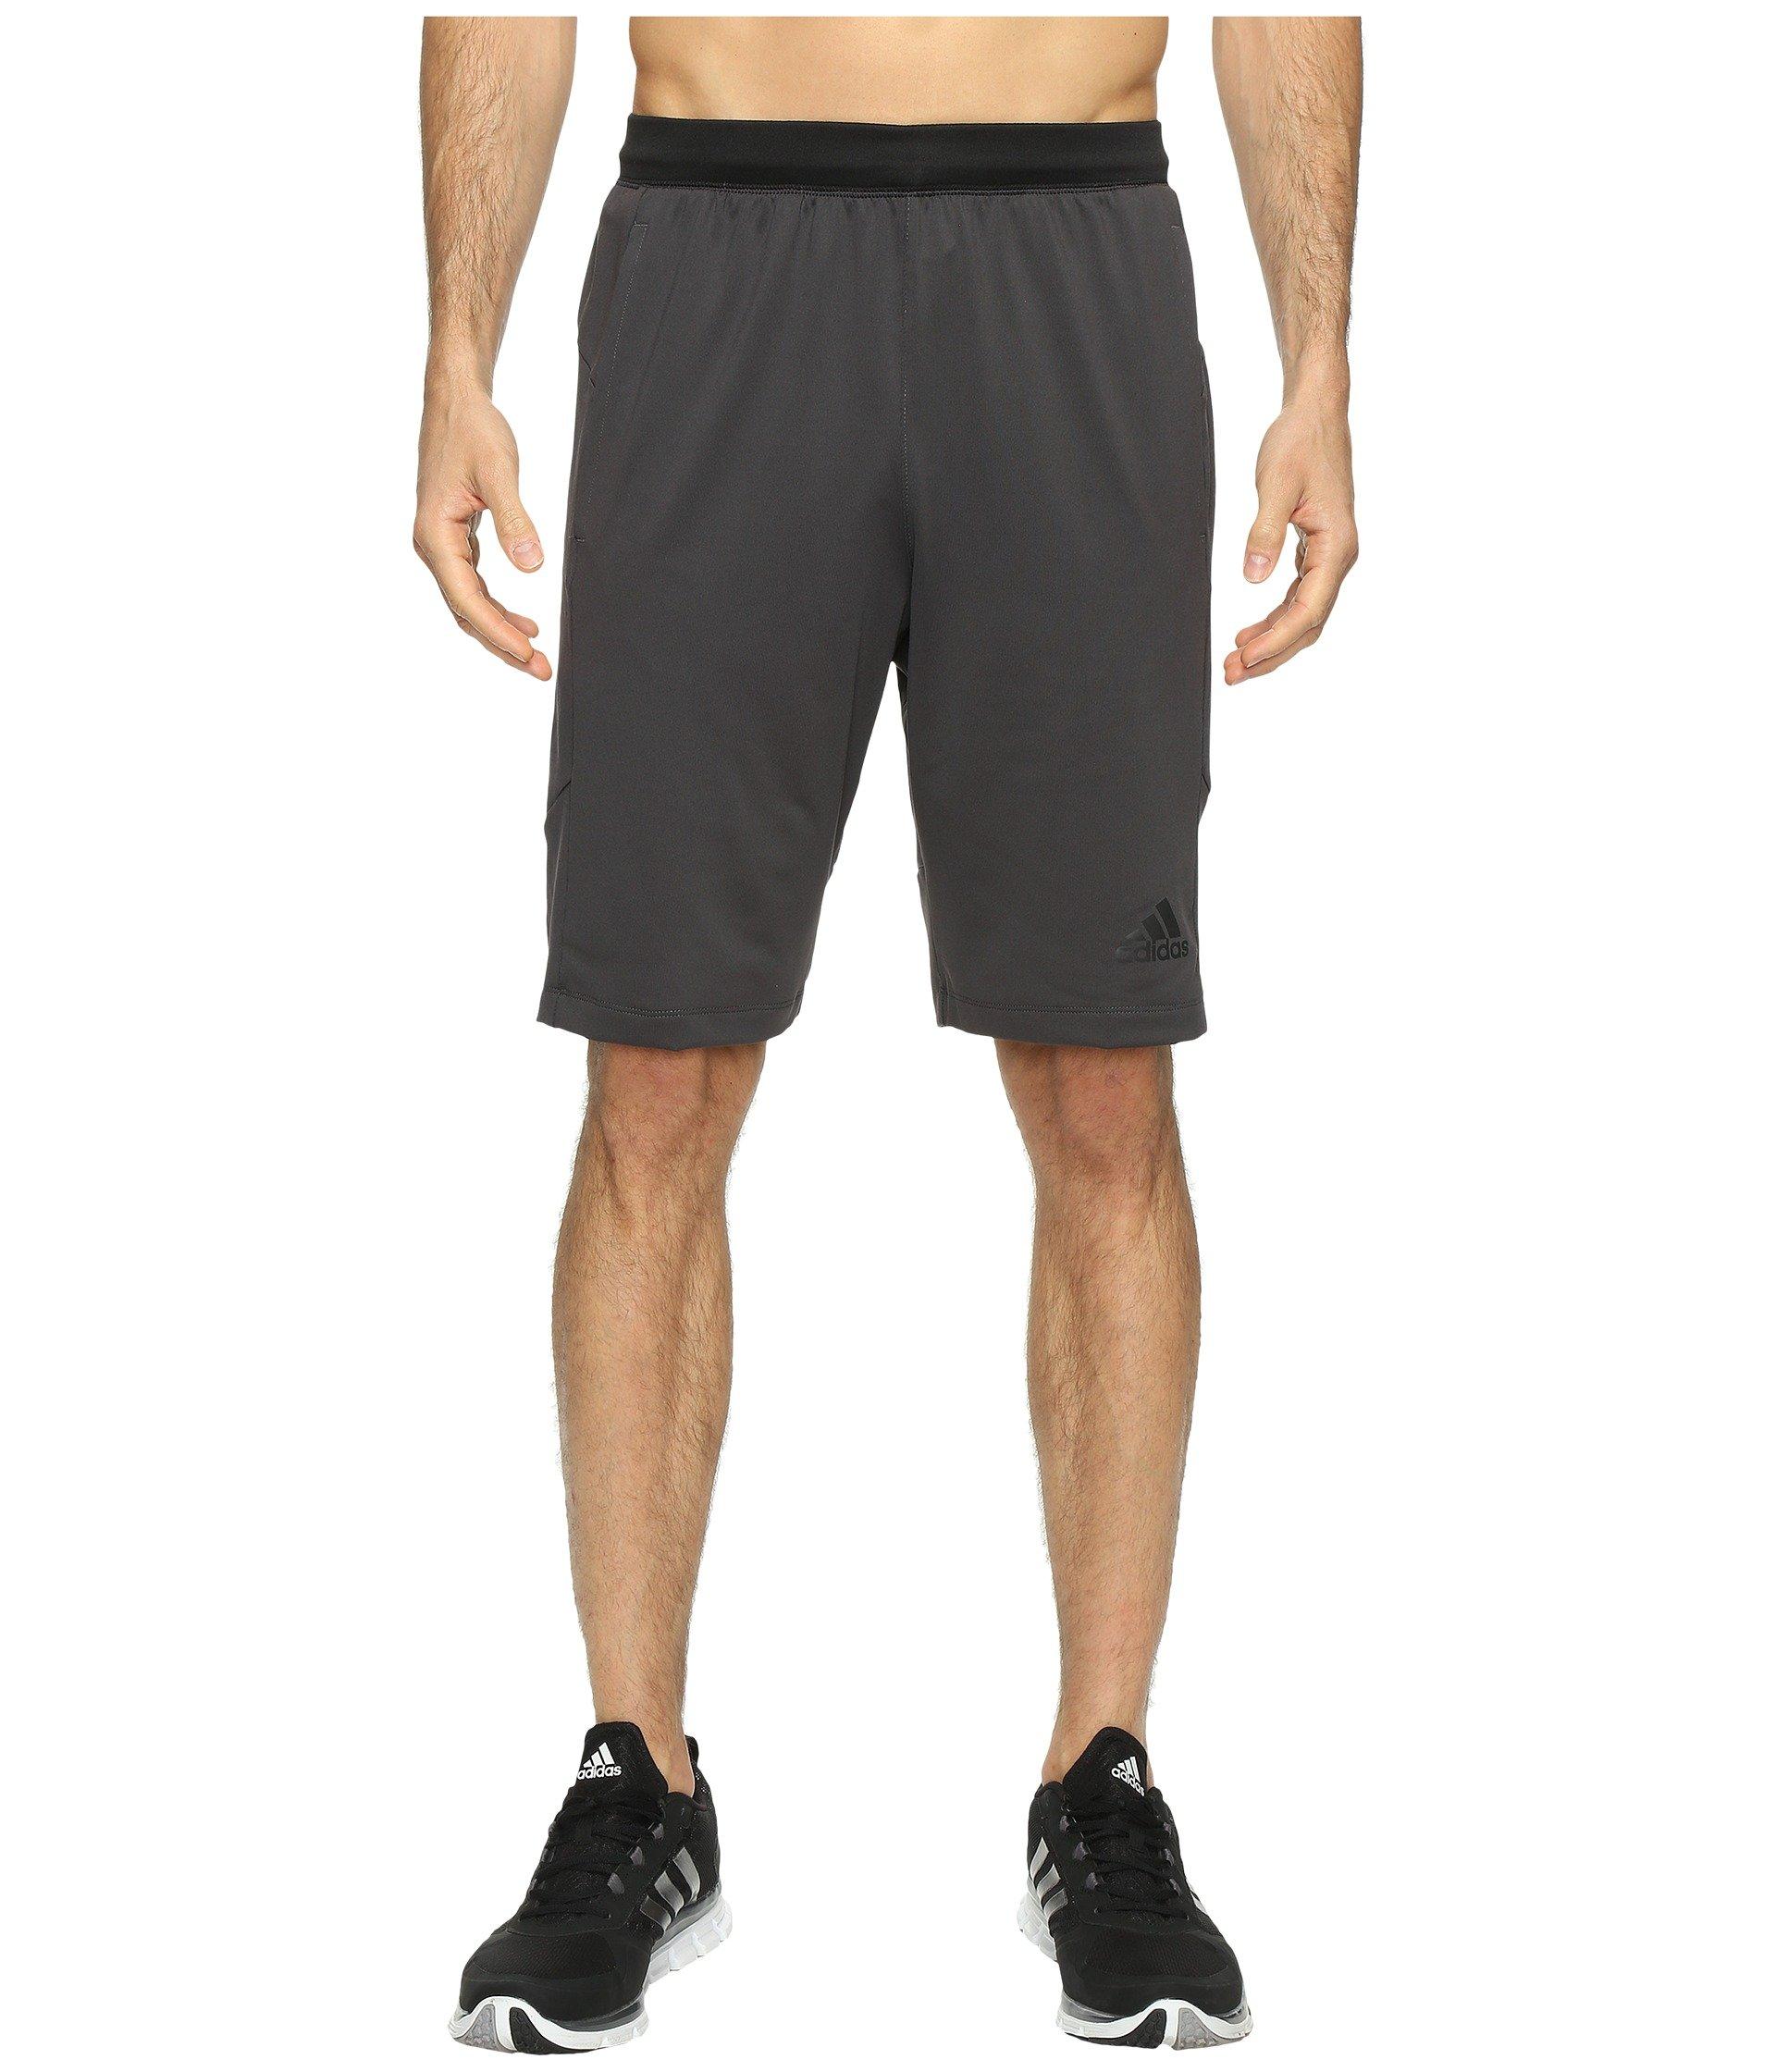 adidas Men's Training Speedbreaker Hype Shorts, Utility Black, Medium